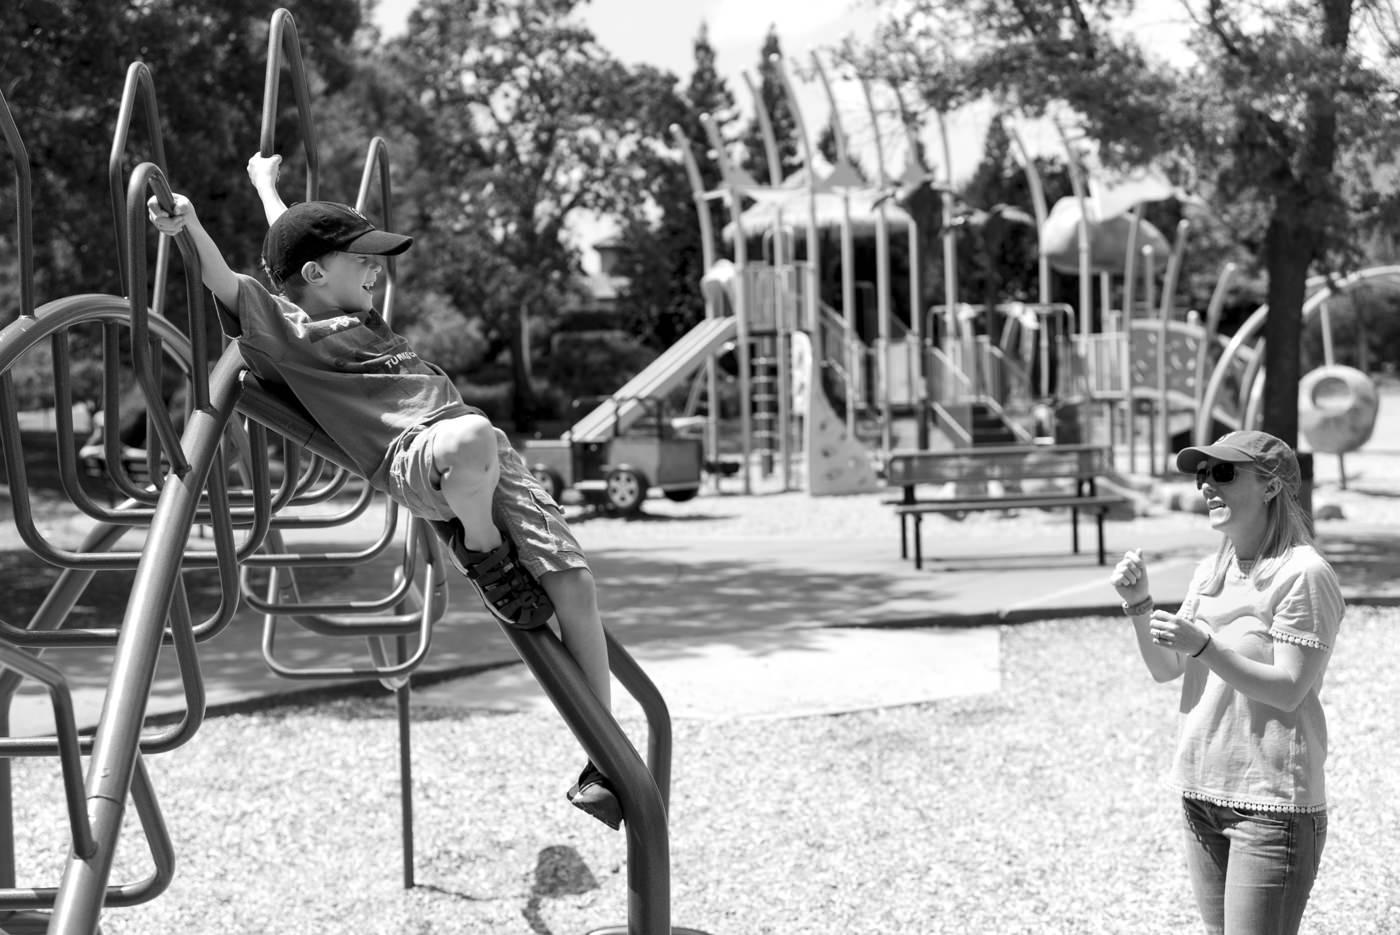 park-david-mullin-13.jpg